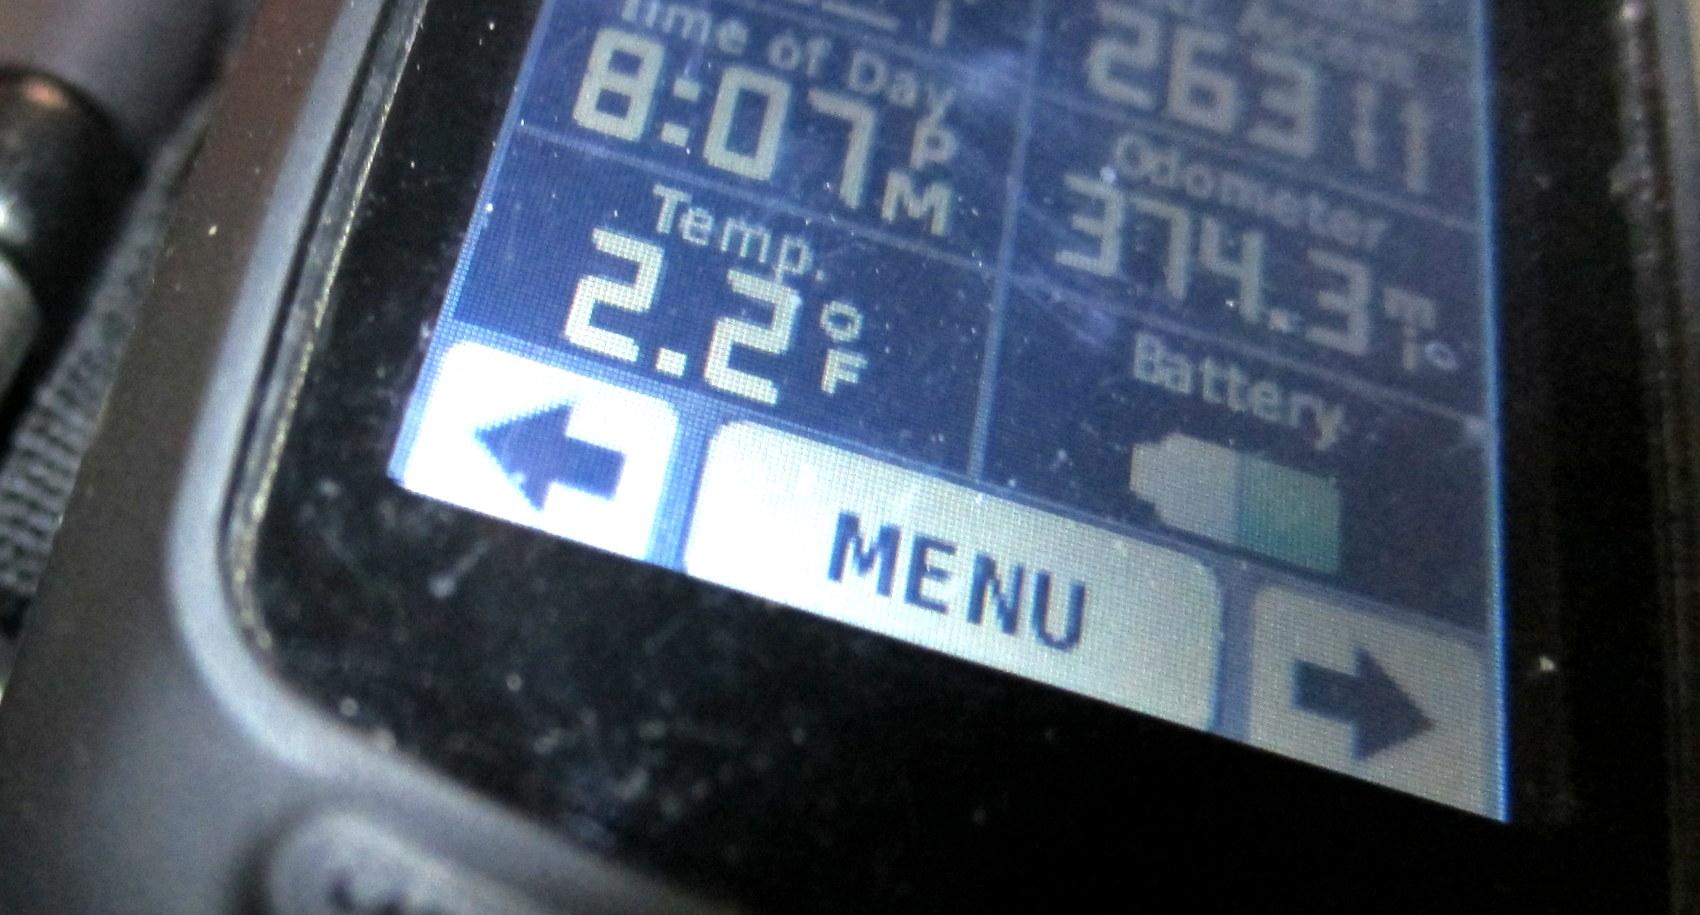 Garmin at 2.2 degrees fahrenheit - photo - Rob Vandermark.JPG